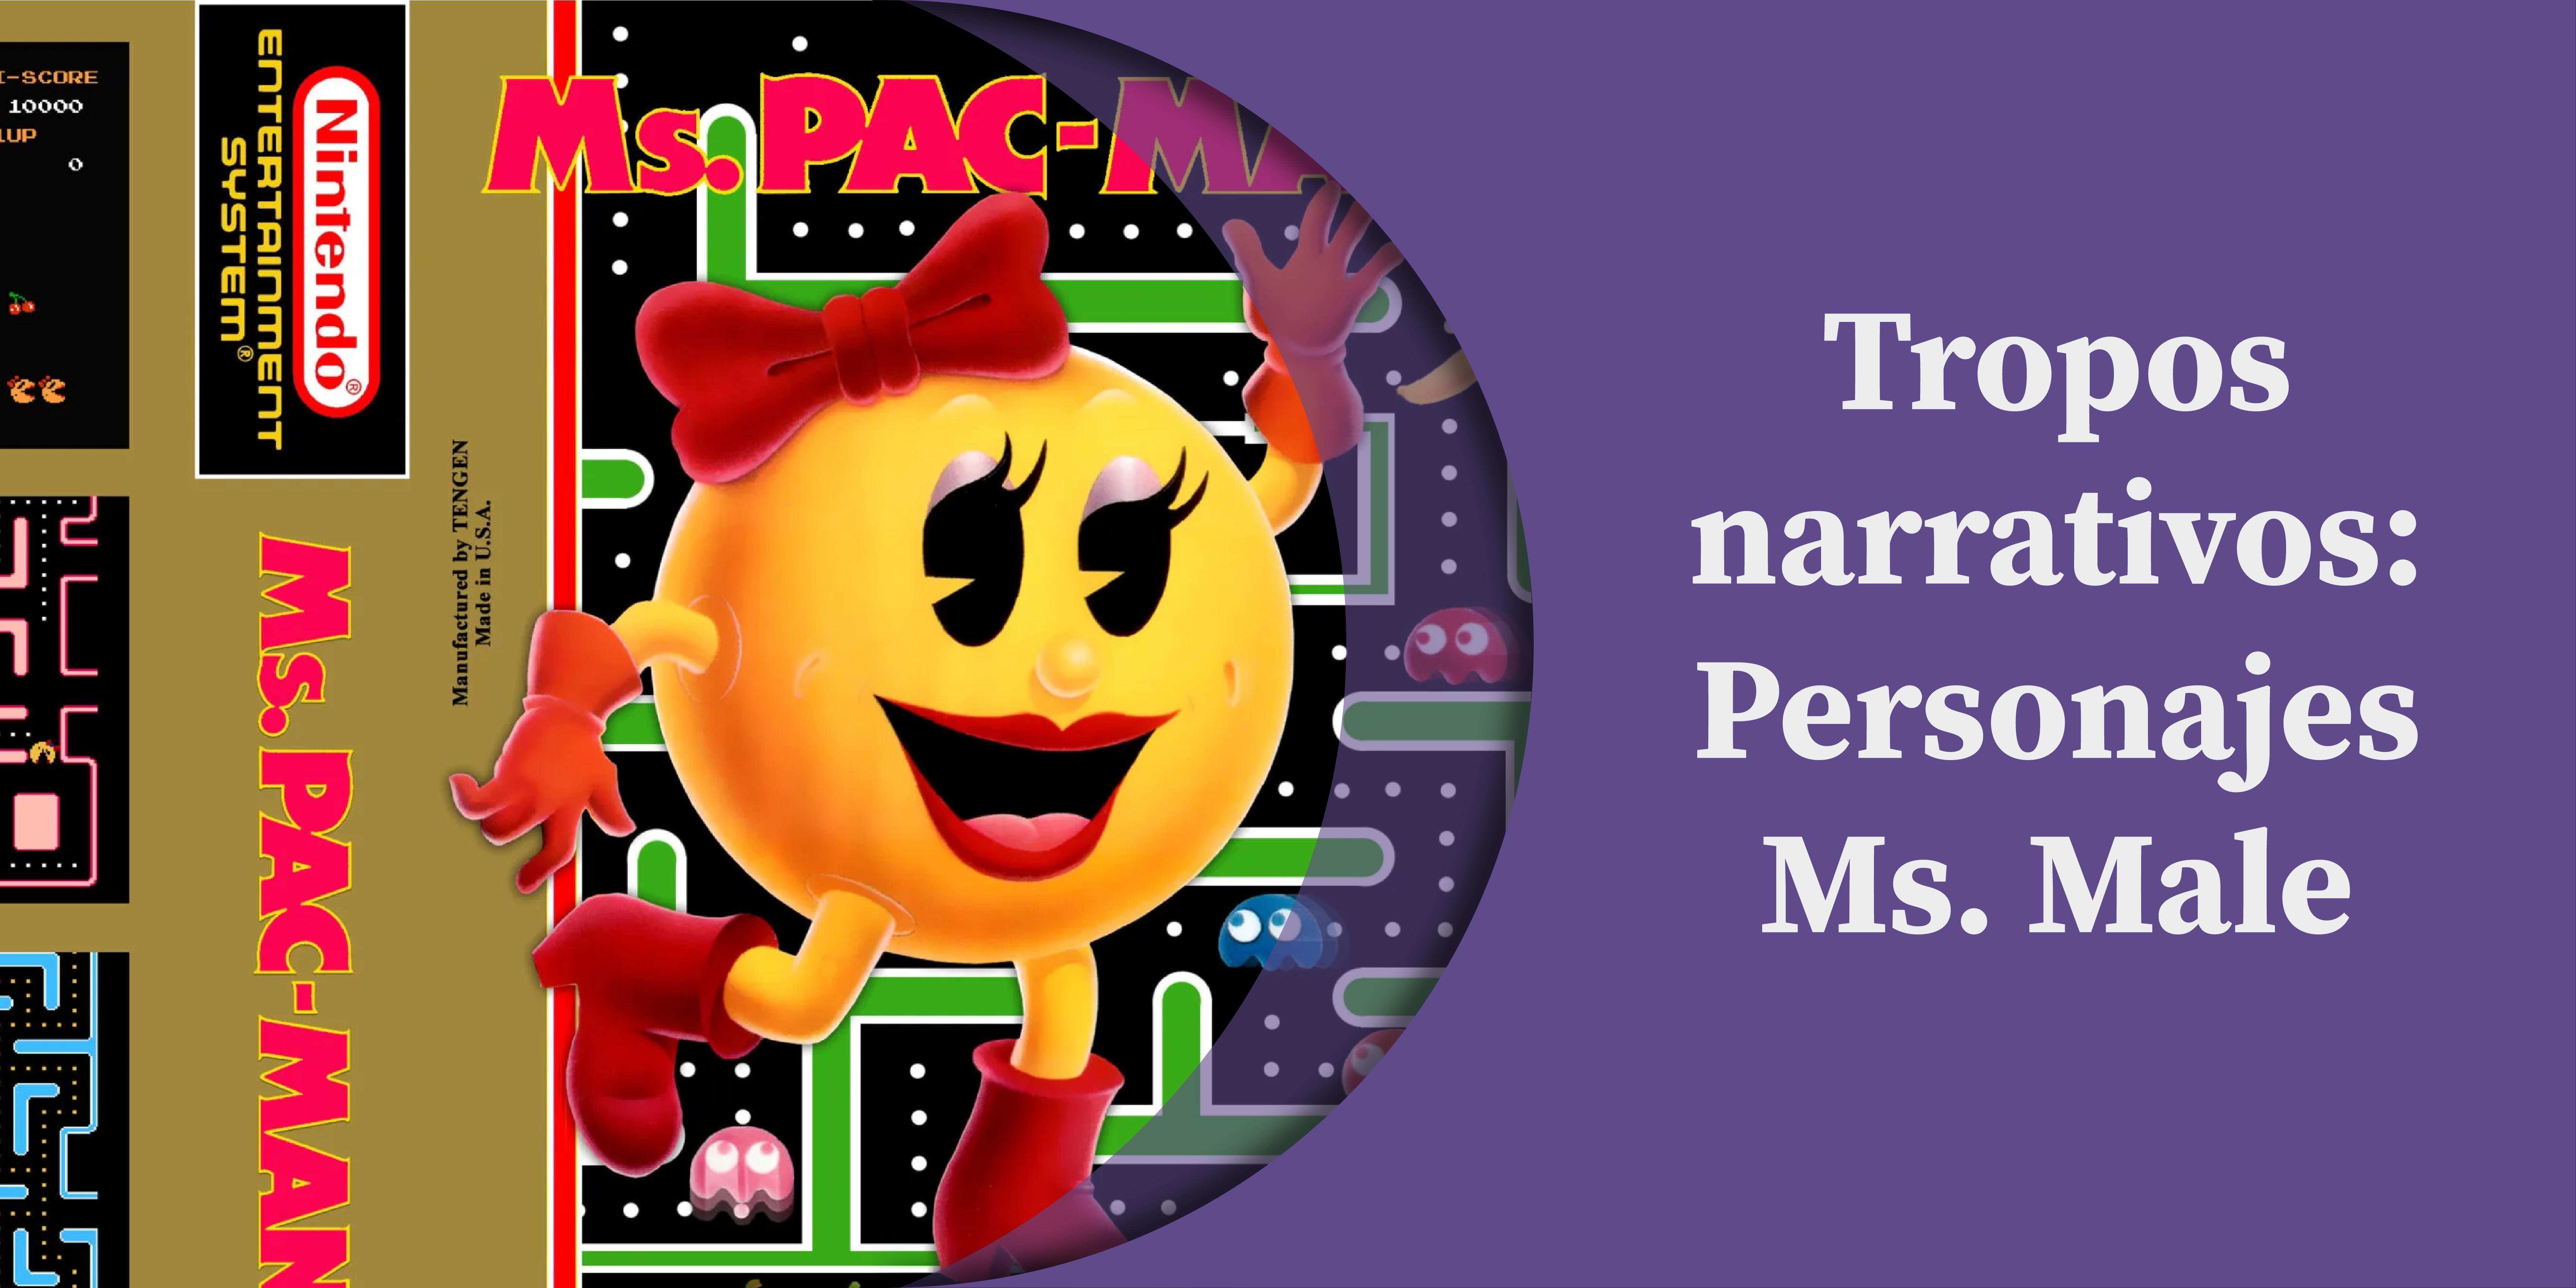 Tropos narrativos: Personajes Ms. Male